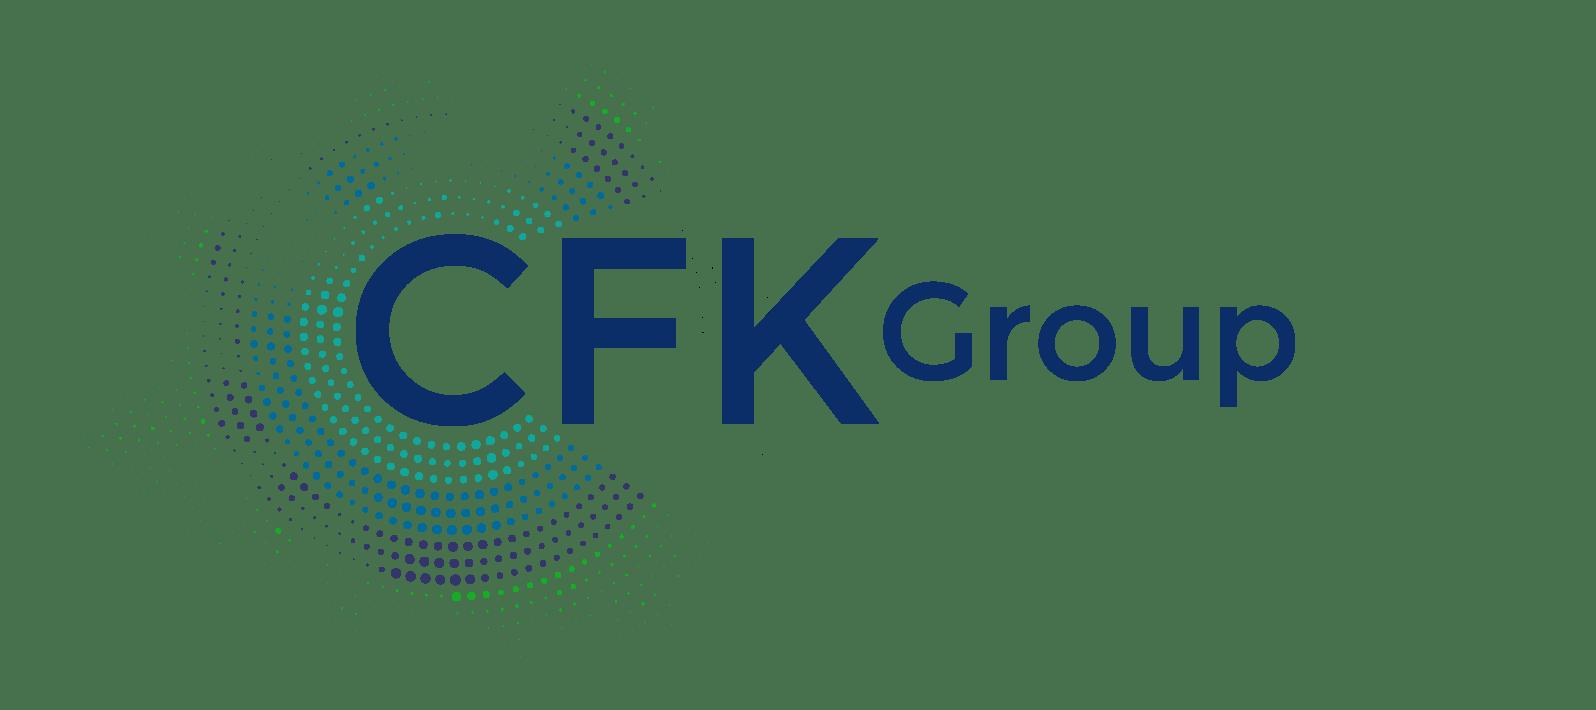 CFK Group